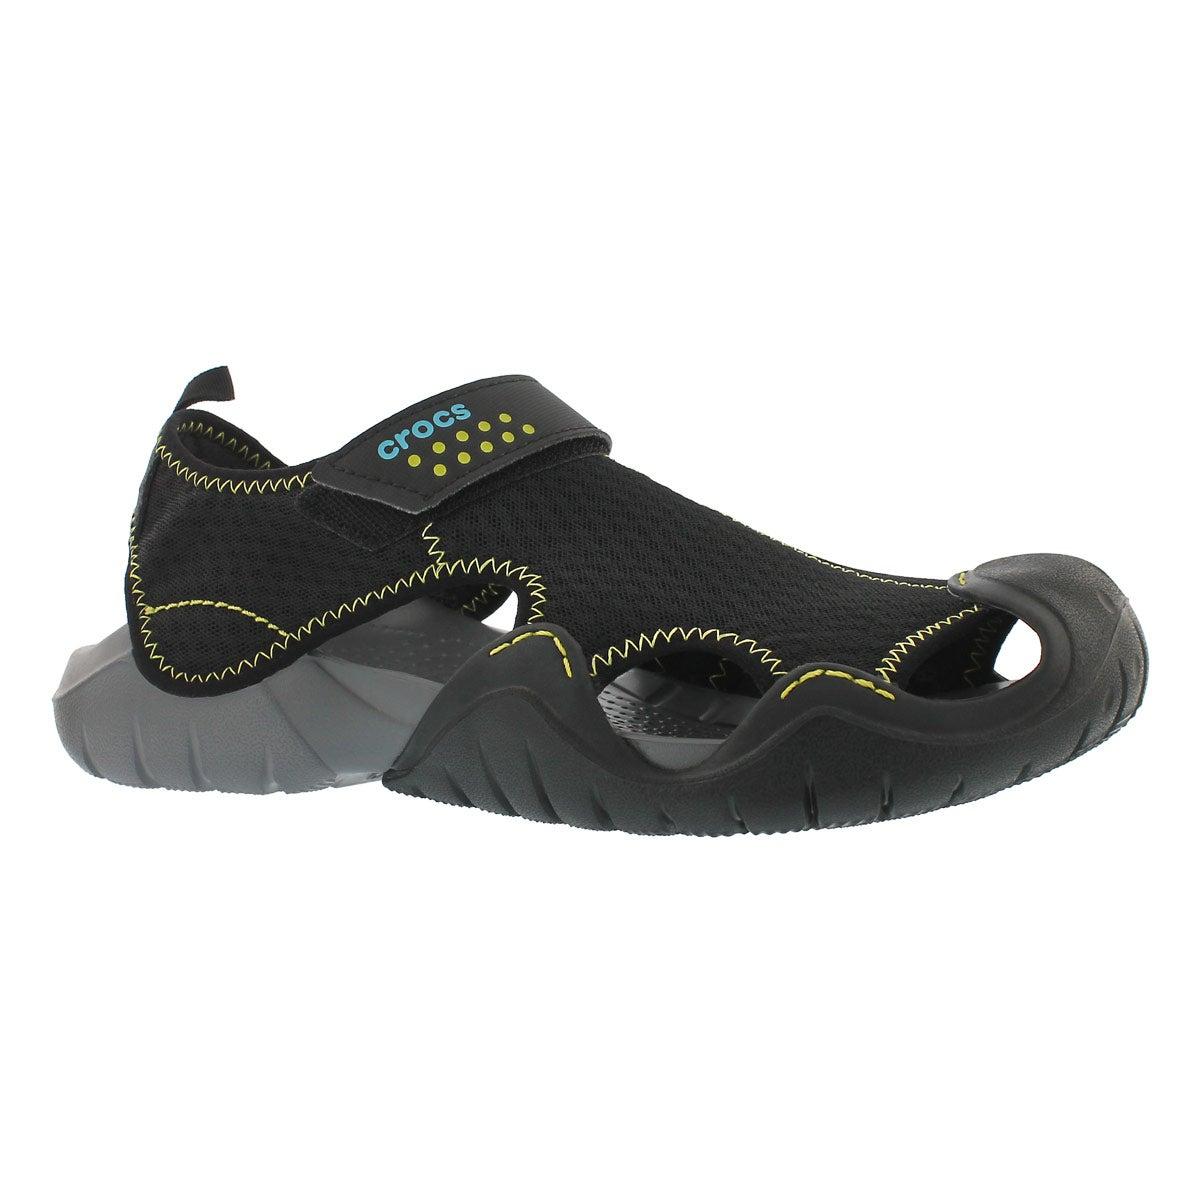 Men's SWIFTWATER blk/charcoal fisherman sandals